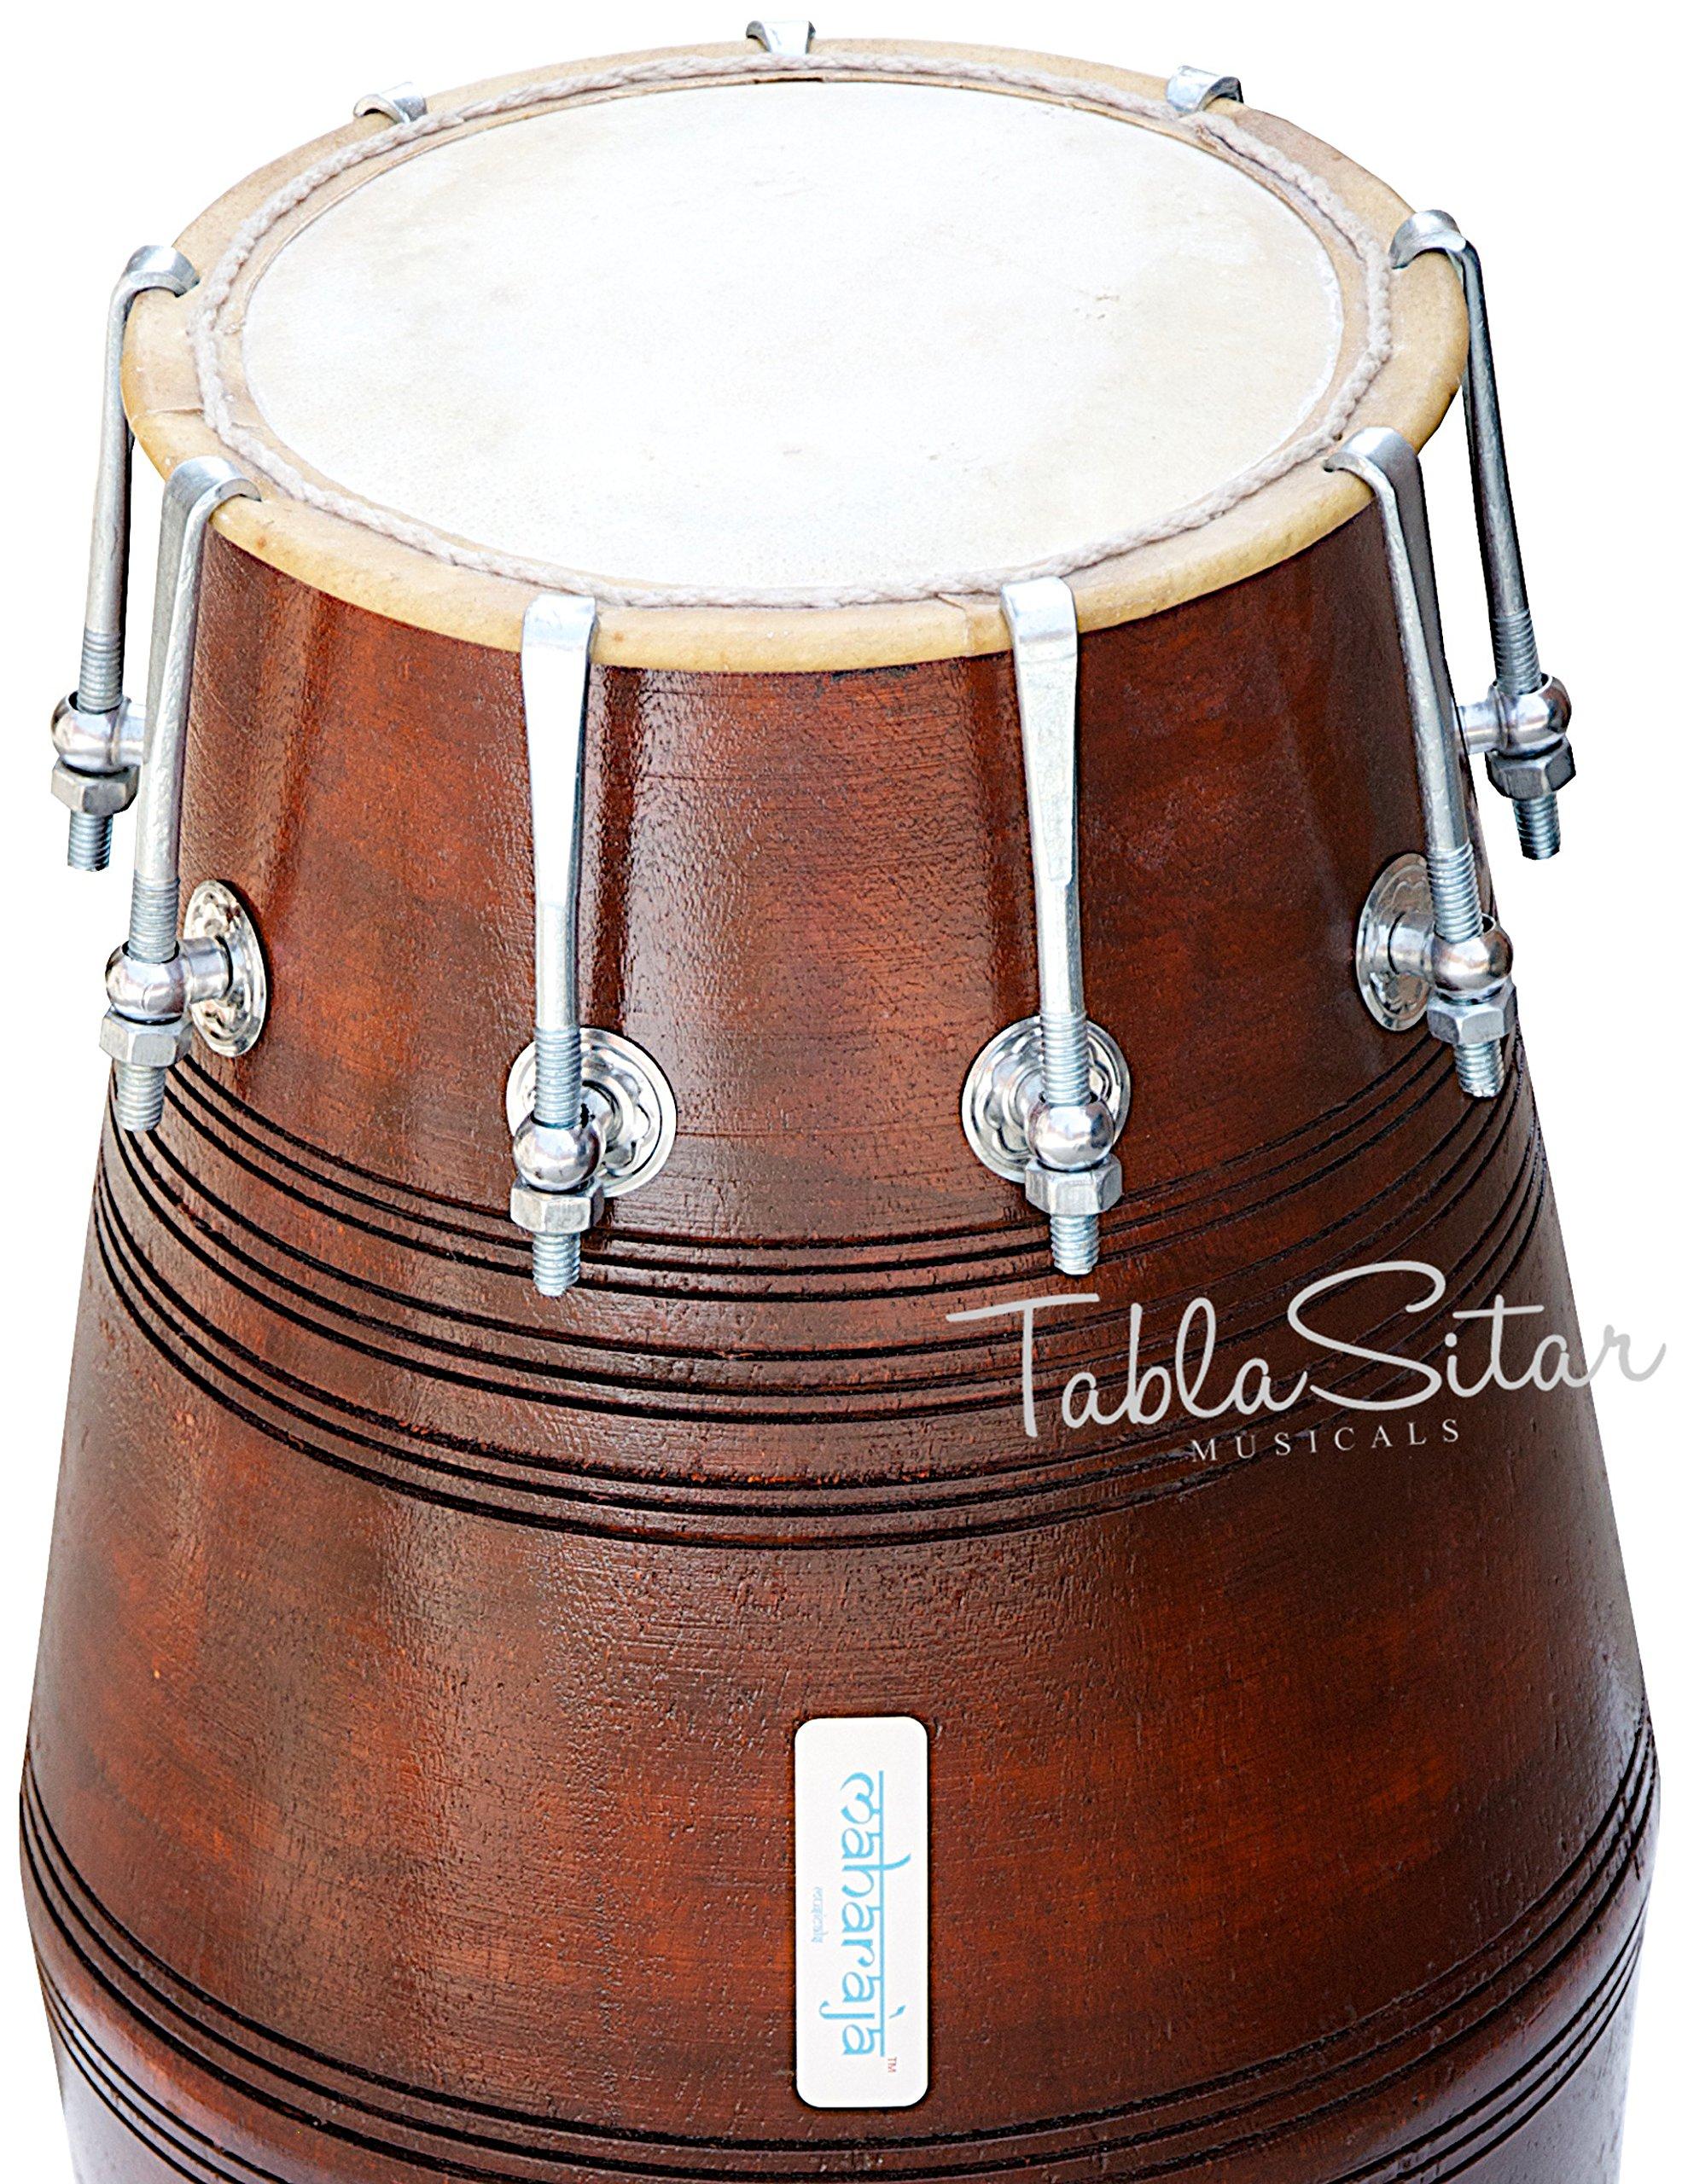 Mahraja Musicals Dholak (Dholki), Special Gajra, Mango Wood, Bolt-tuned, Padded Bag, Spanner, Dholak Drum(PDI-BGA) by Maharaja Musicals (Image #5)